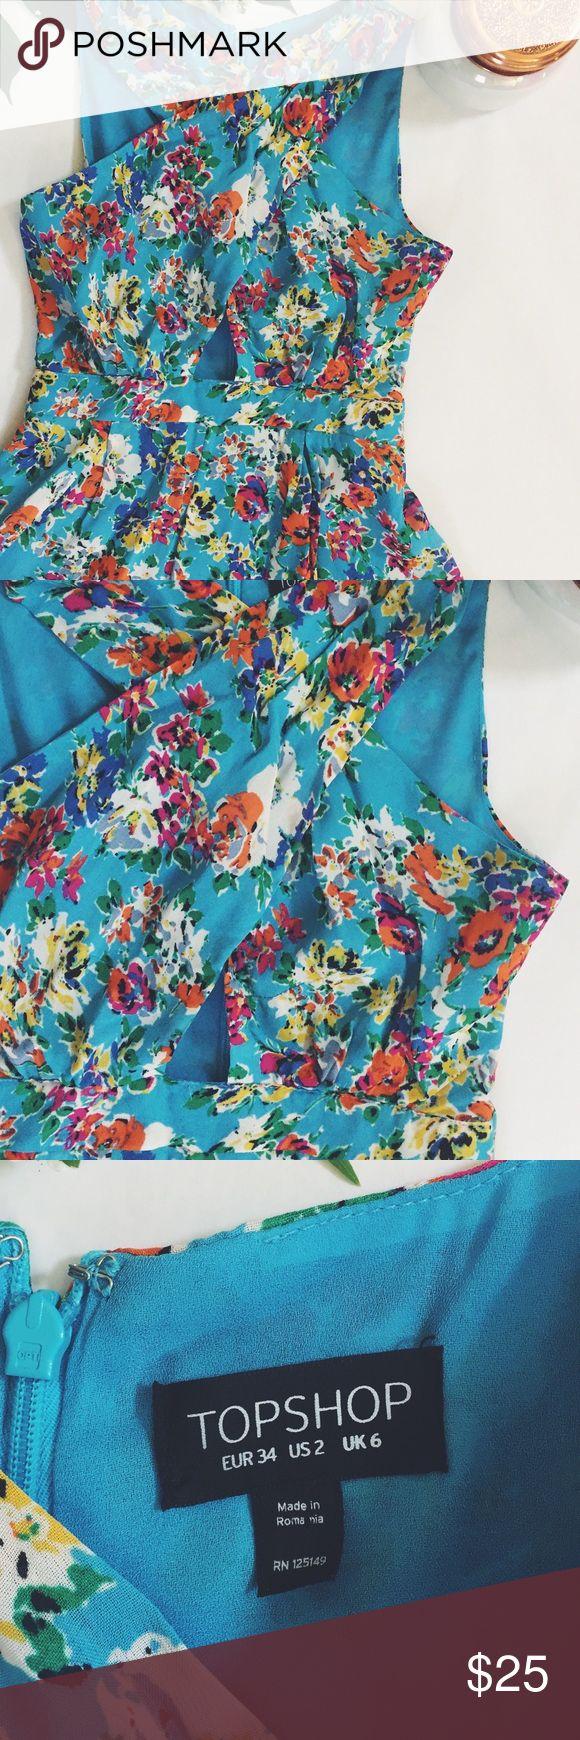 Topshop shorts romper Flower print with flows shorts bottom Topshop Shorts